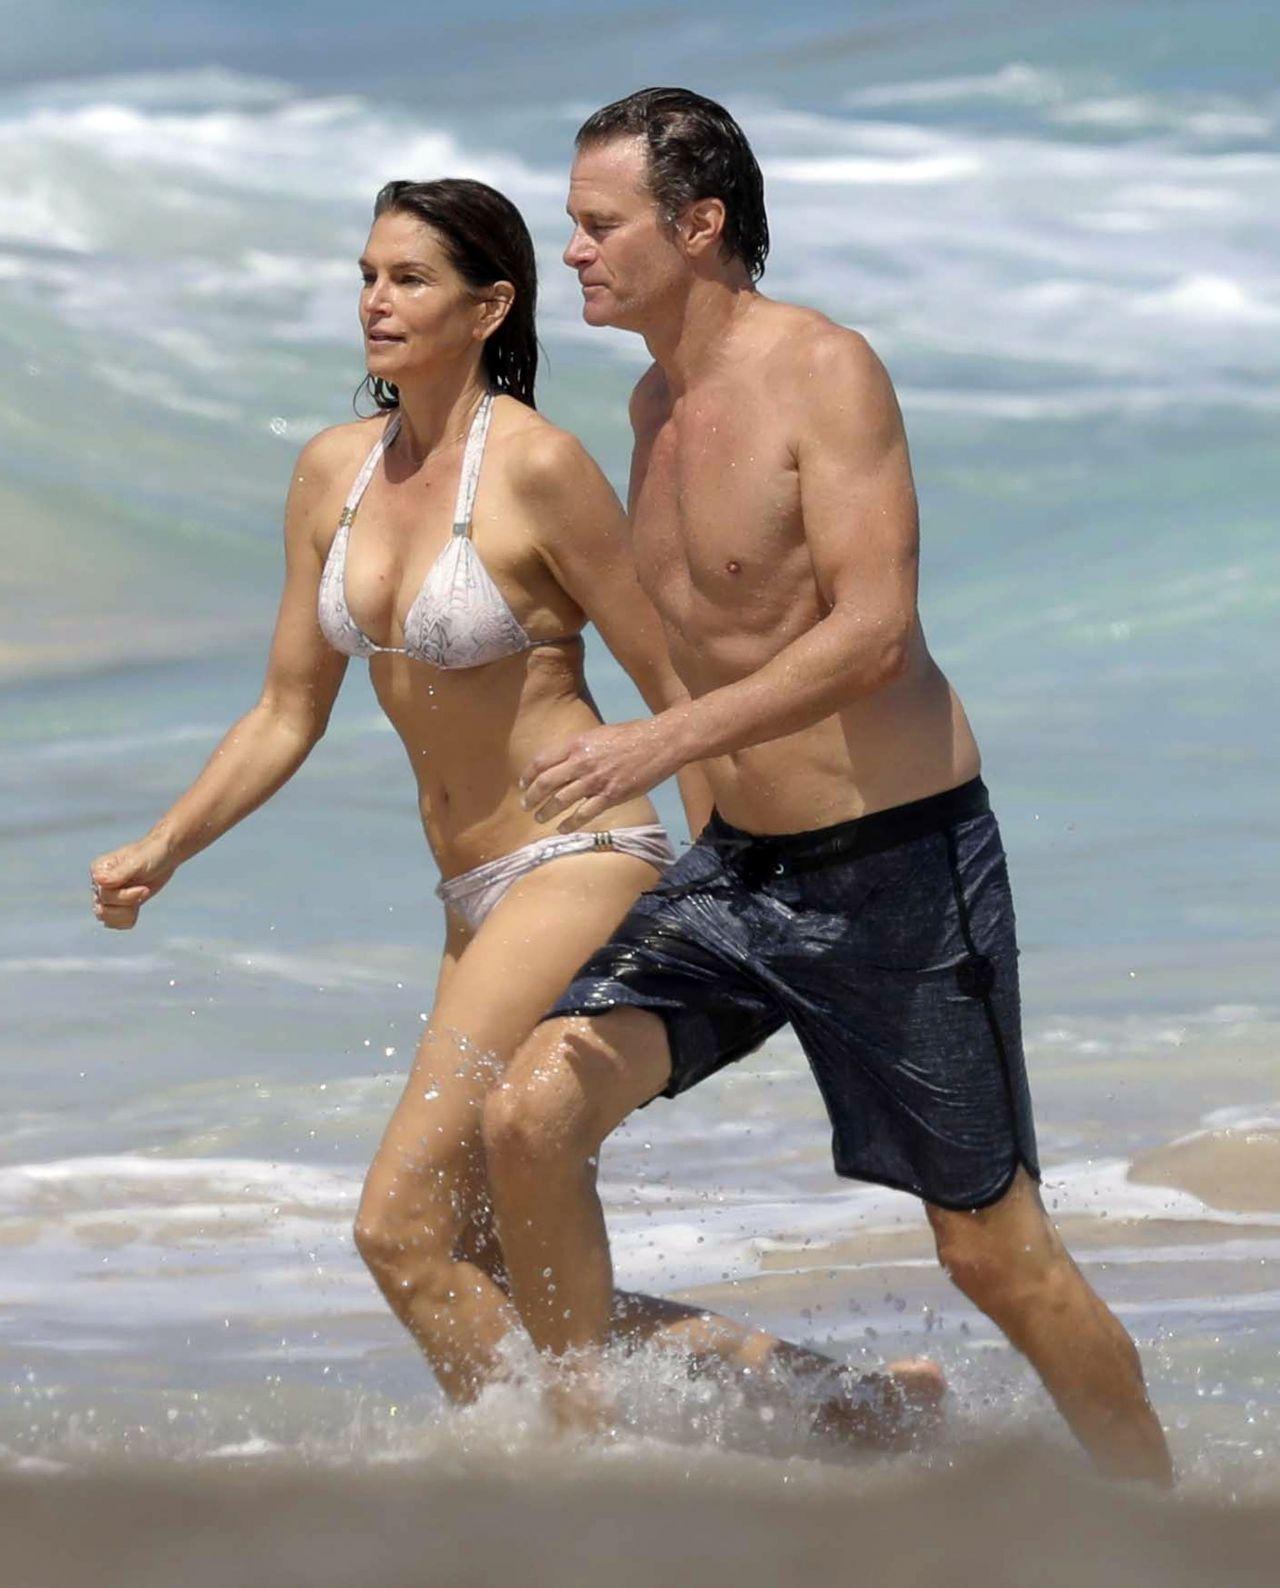 Selfie Cayley King nudes (19 foto and video), Tits, Hot, Selfie, in bikini 2006